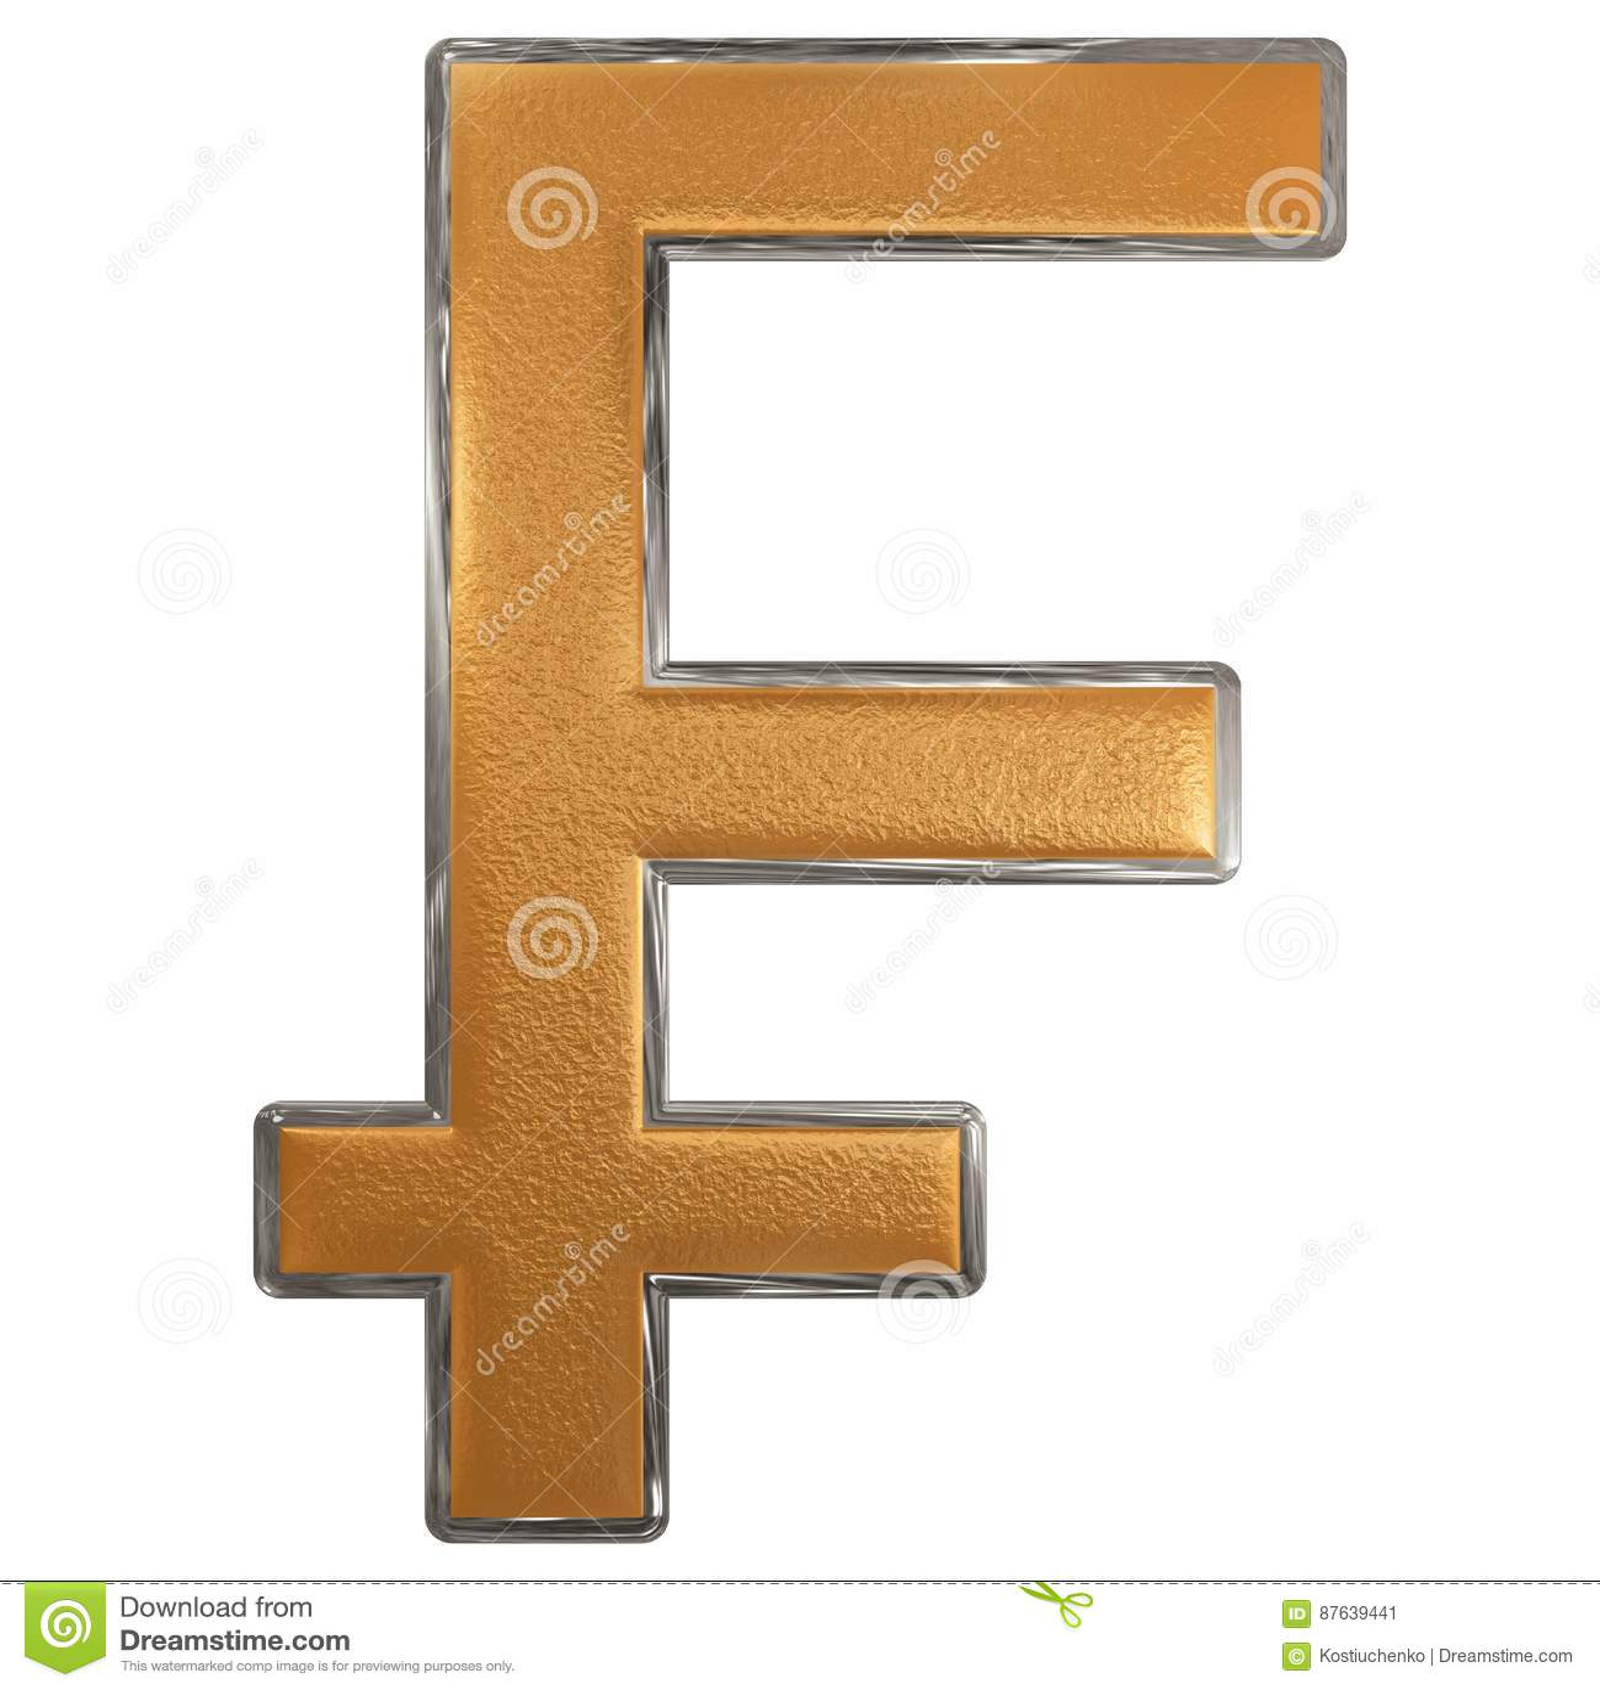 Symbol Of French Franc. Isolated On White Background. 3D Illust Stock Illustration - Illustration of metal. golden: 87639441